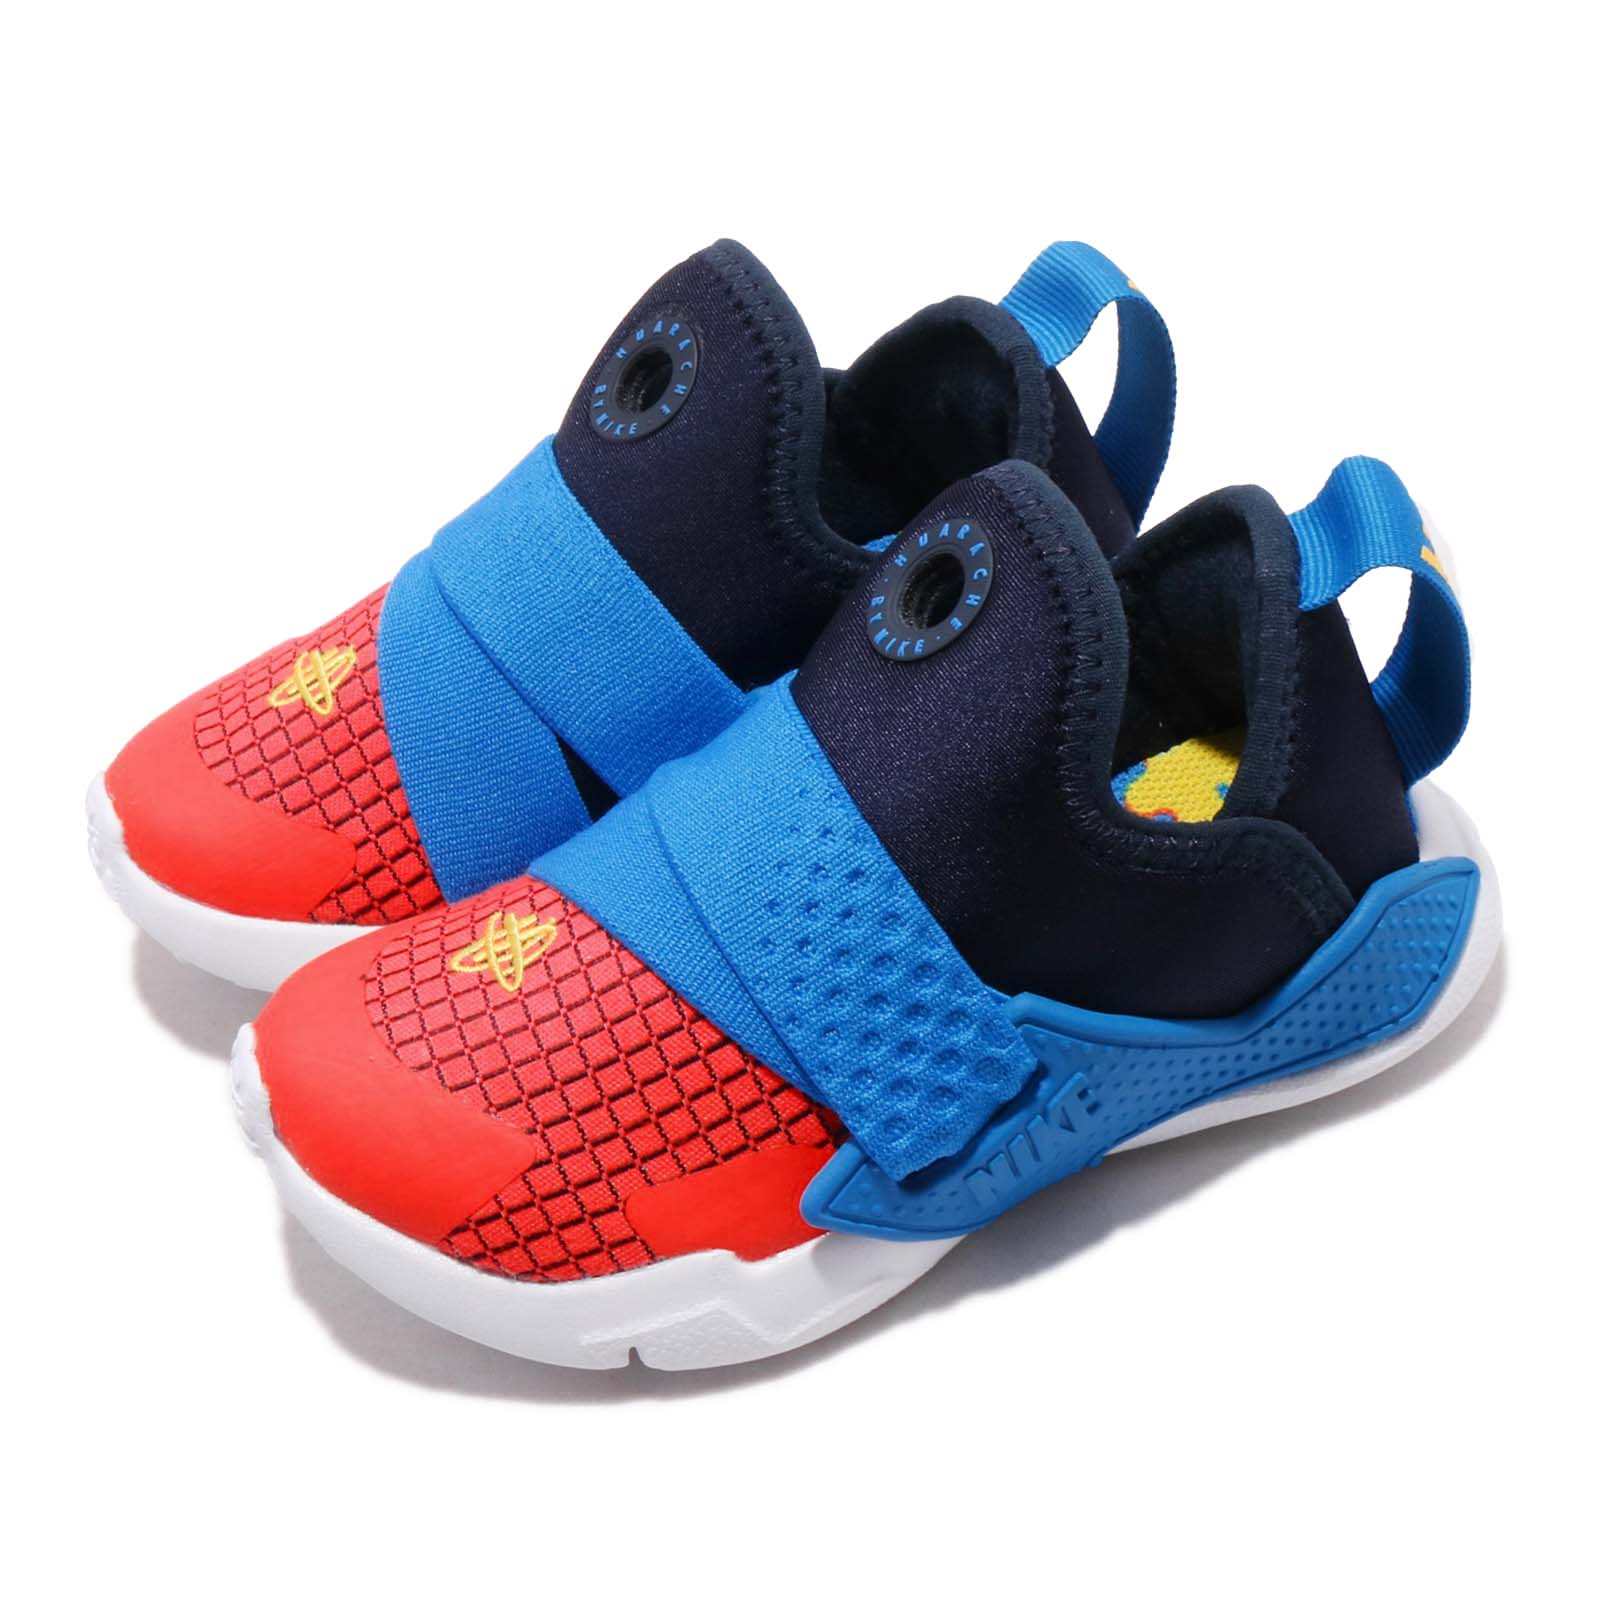 Nike 休閒鞋 Huarache Extreme 童鞋 BQ7570-400